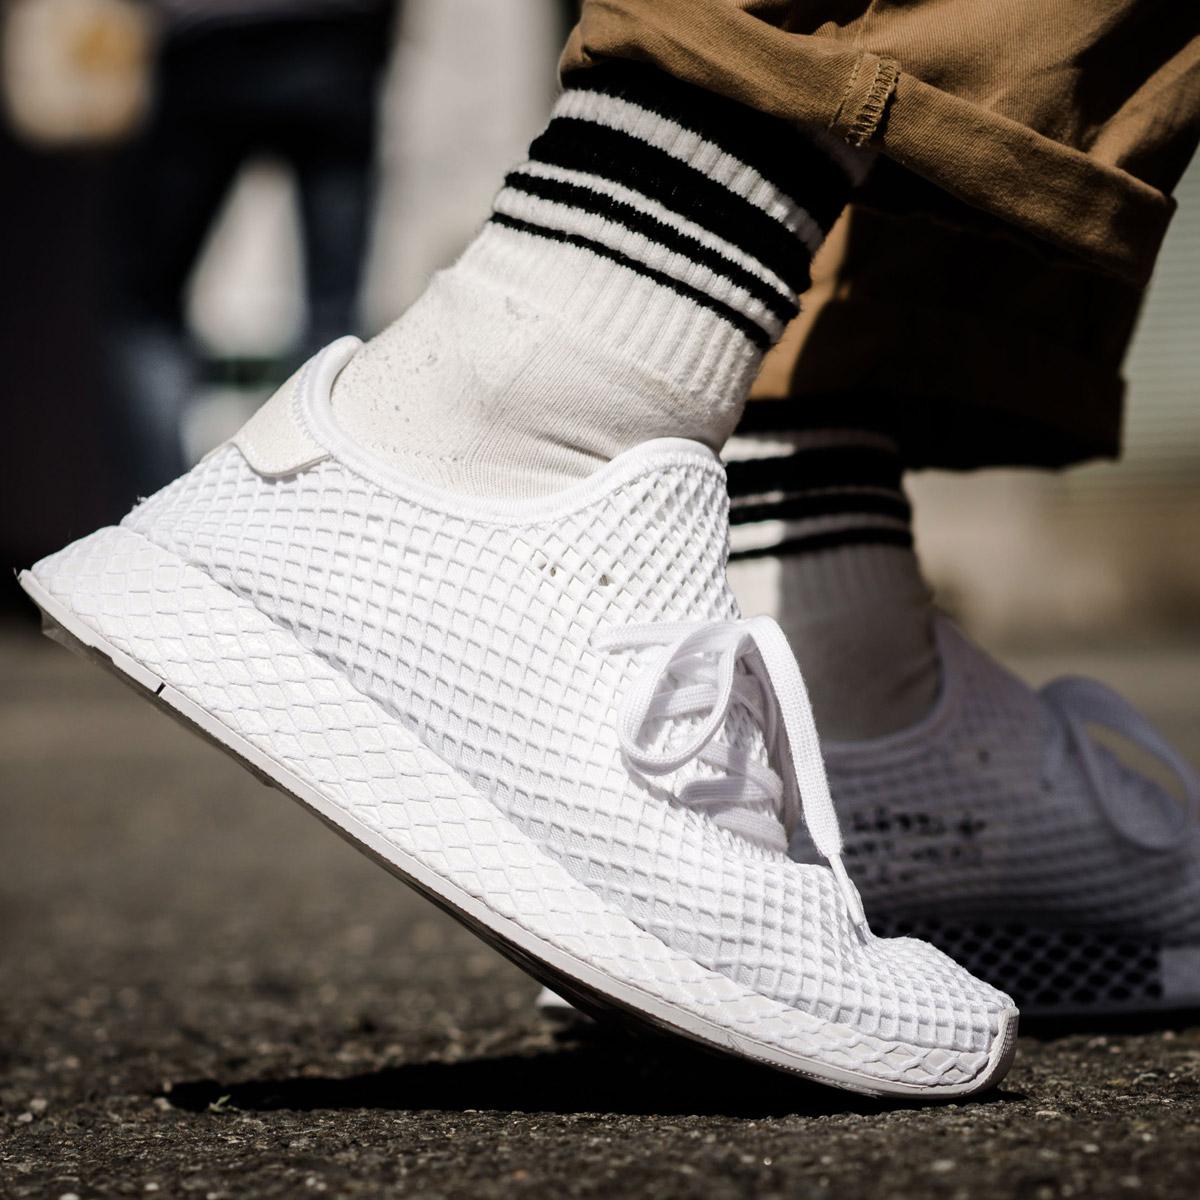 adidas Originals DEERUPT RUNNER(アディダス オリジナルス ディーラプト ランナー)(Running White/Running White/Running White)18SS-I